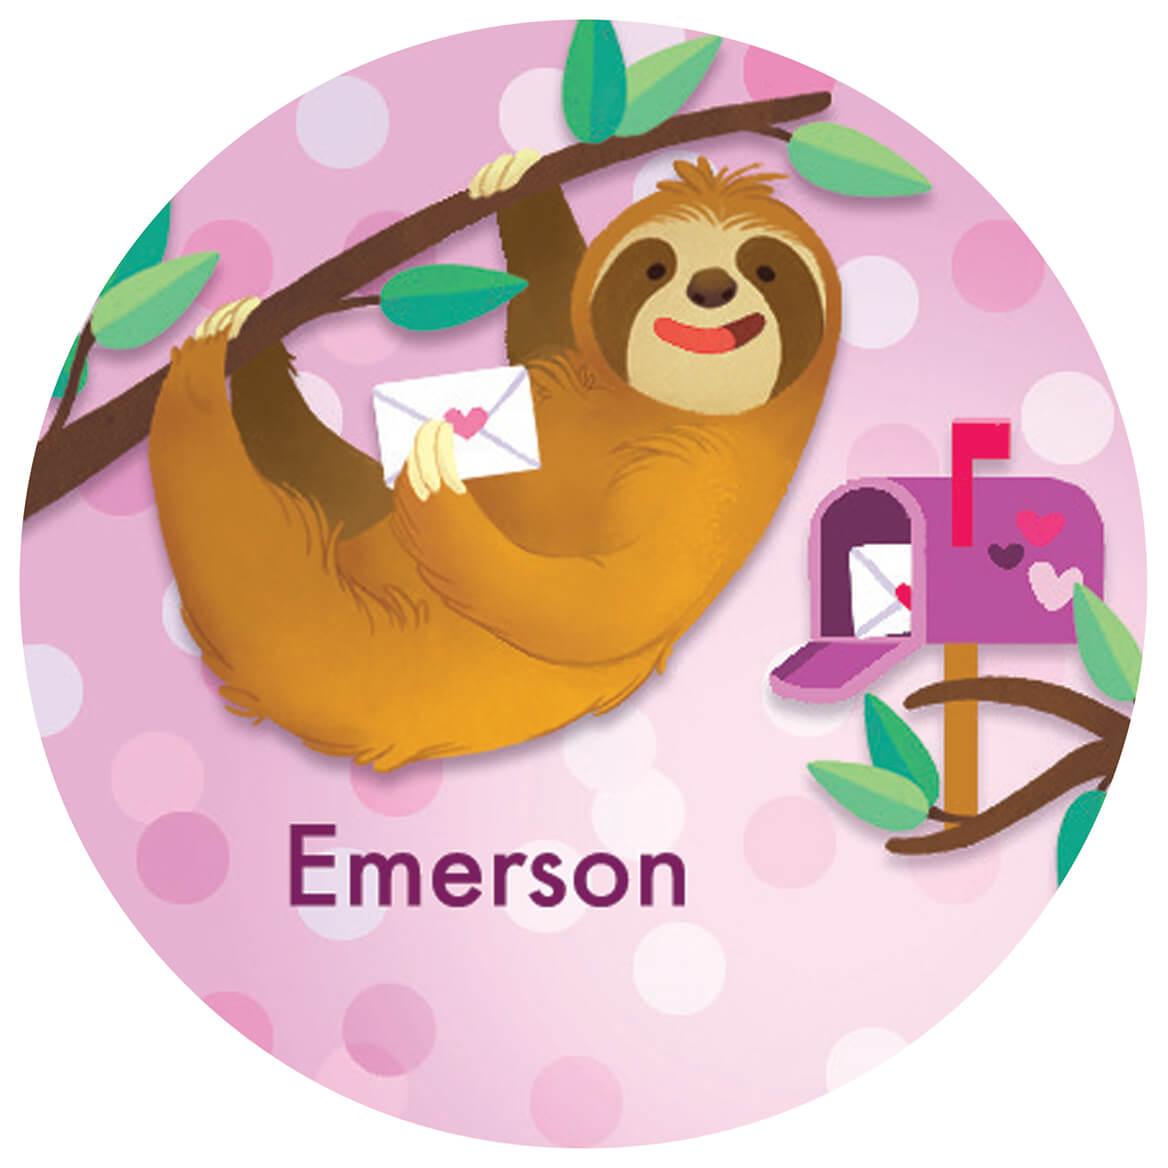 Personalized Children's Valentine's Day Stickers, Set of 240-370376